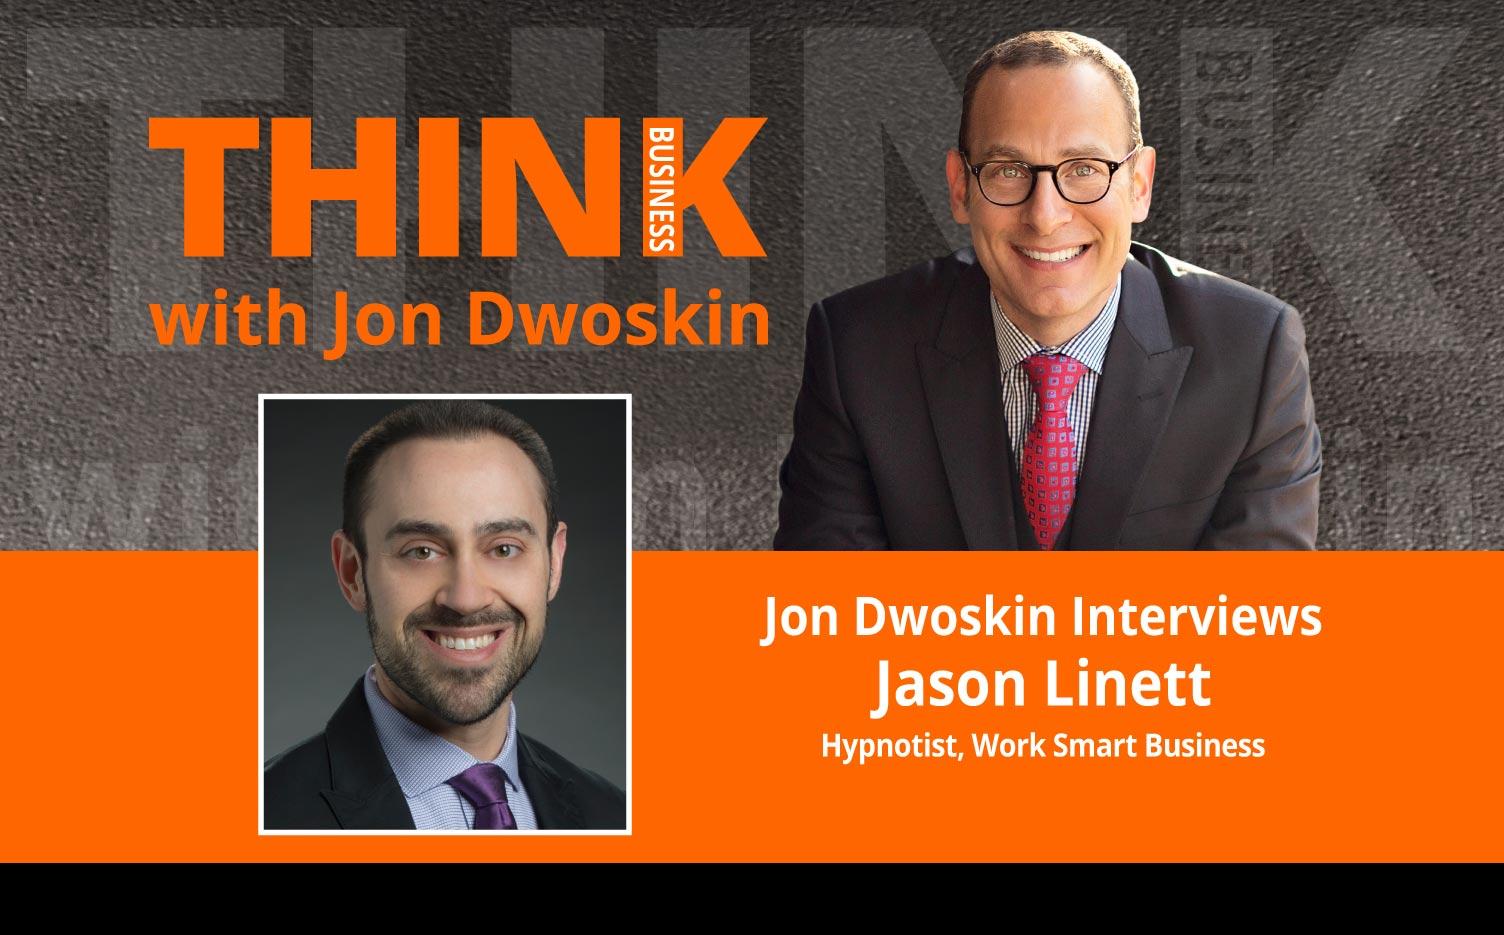 THINK Business Podcast: Jon Dwoskin Interviews Jason Linett, Hypnotist, Work Smart Business